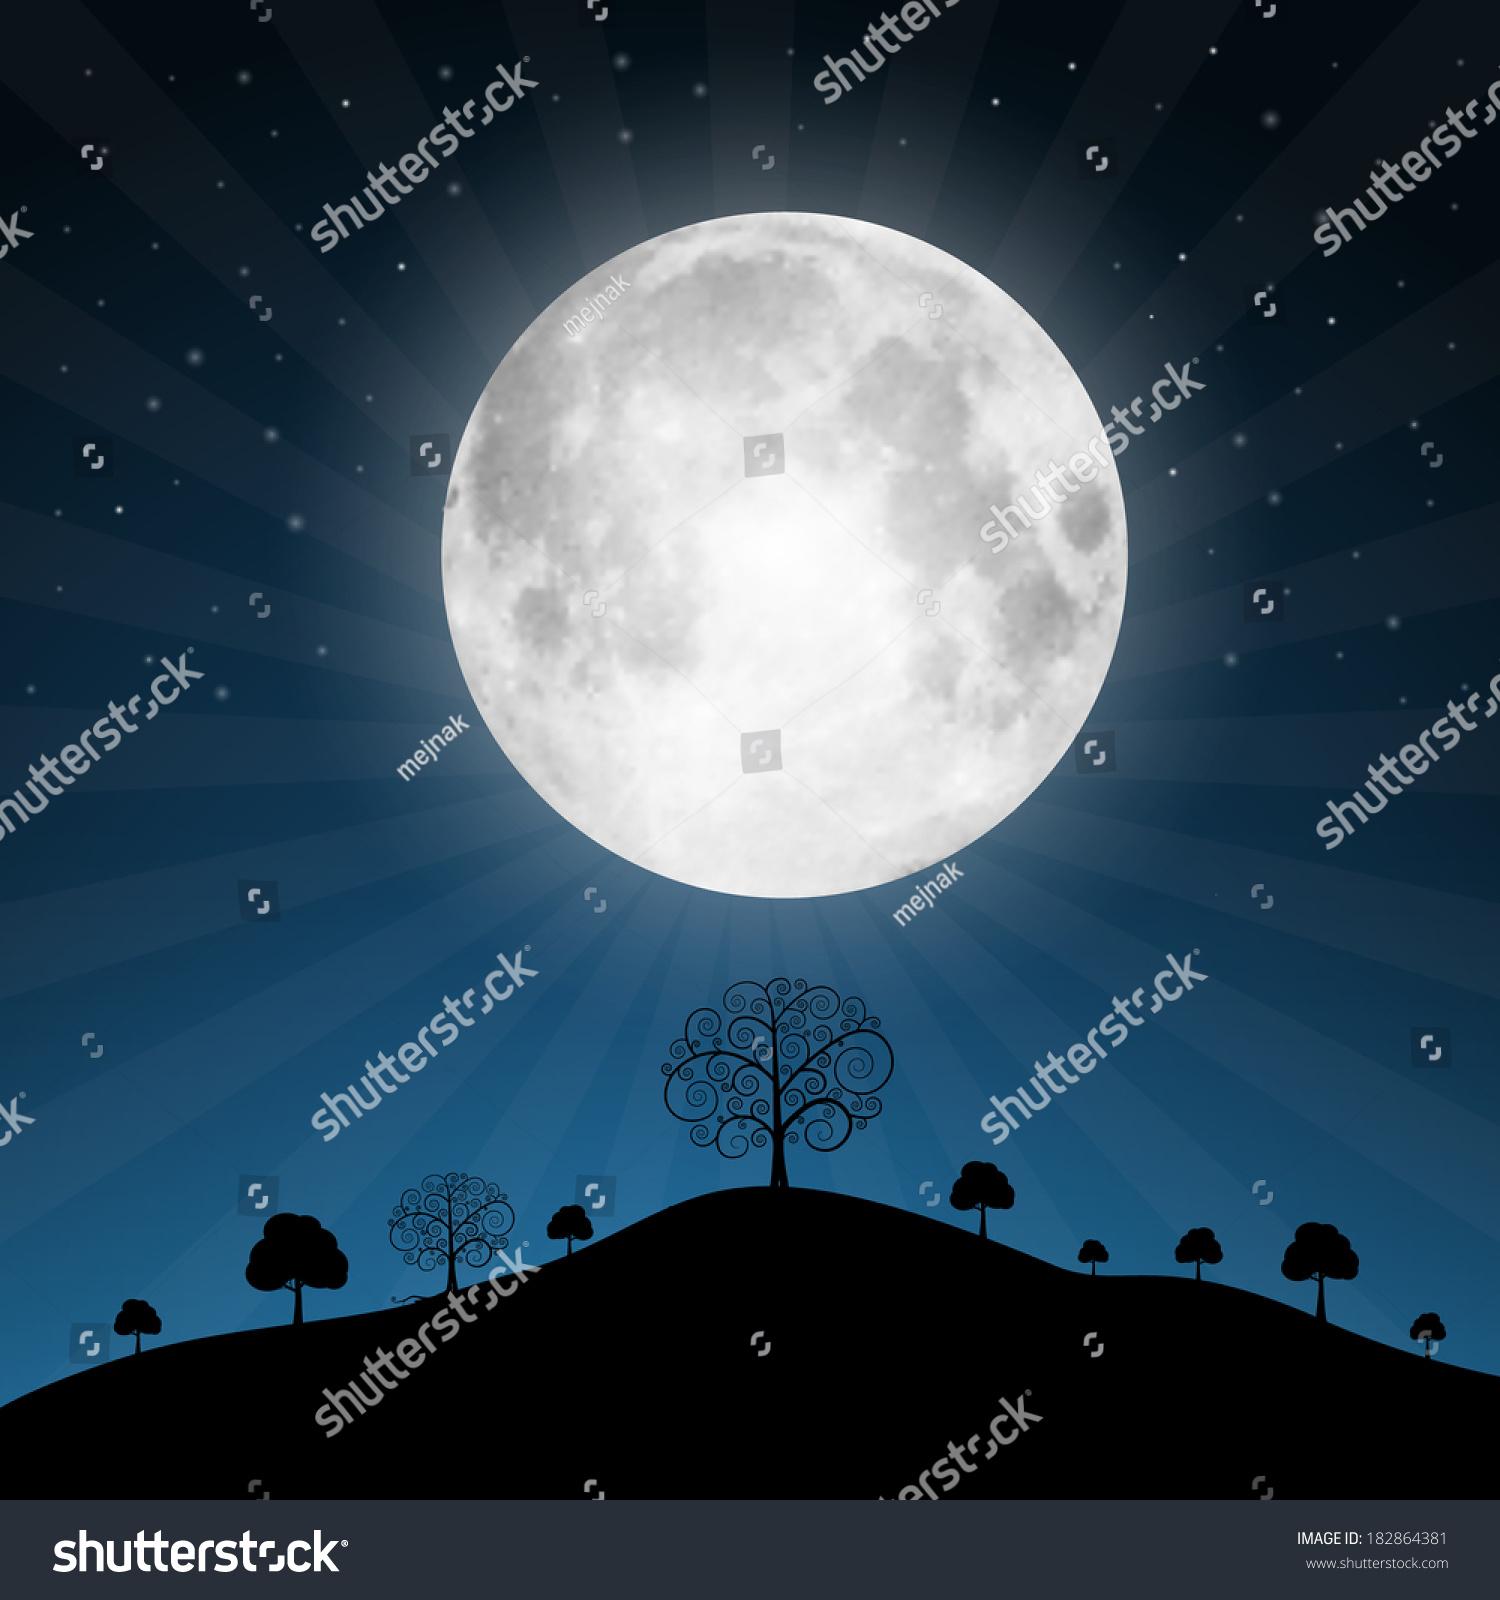 Moon Calendar Illustration : Vector full moon illustration with stars and trees